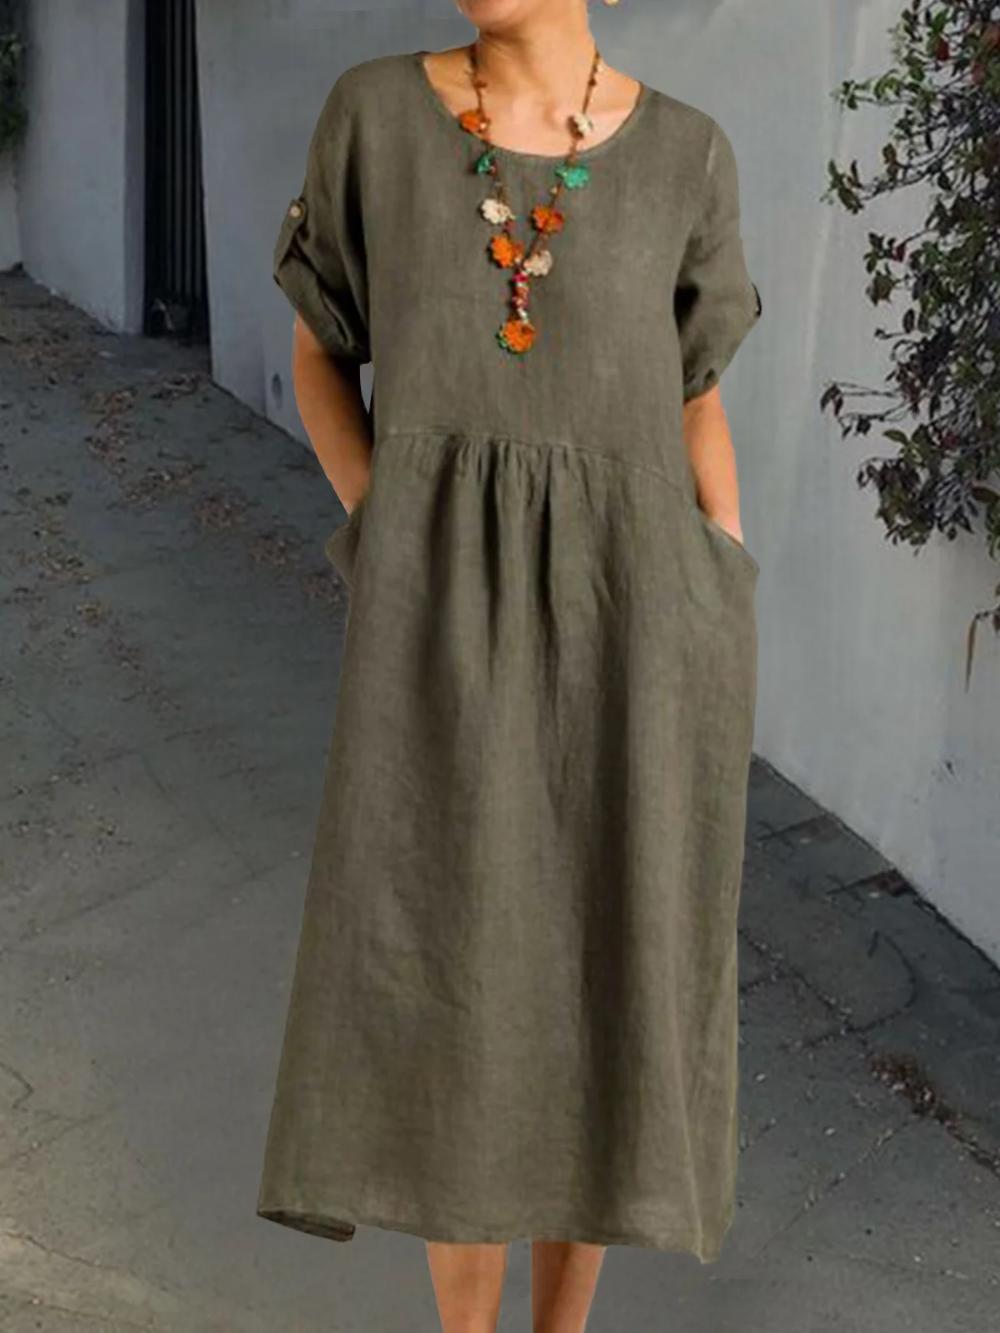 Solid Pockets Midi Dress 3 4 Sleeve Dresses Dresses Solid Pockets Midi Dress 3 4 Sleeve Dresses Justfashionnow In 2021 Midi Dress Sleeves Dresses [ 1333 x 1000 Pixel ]